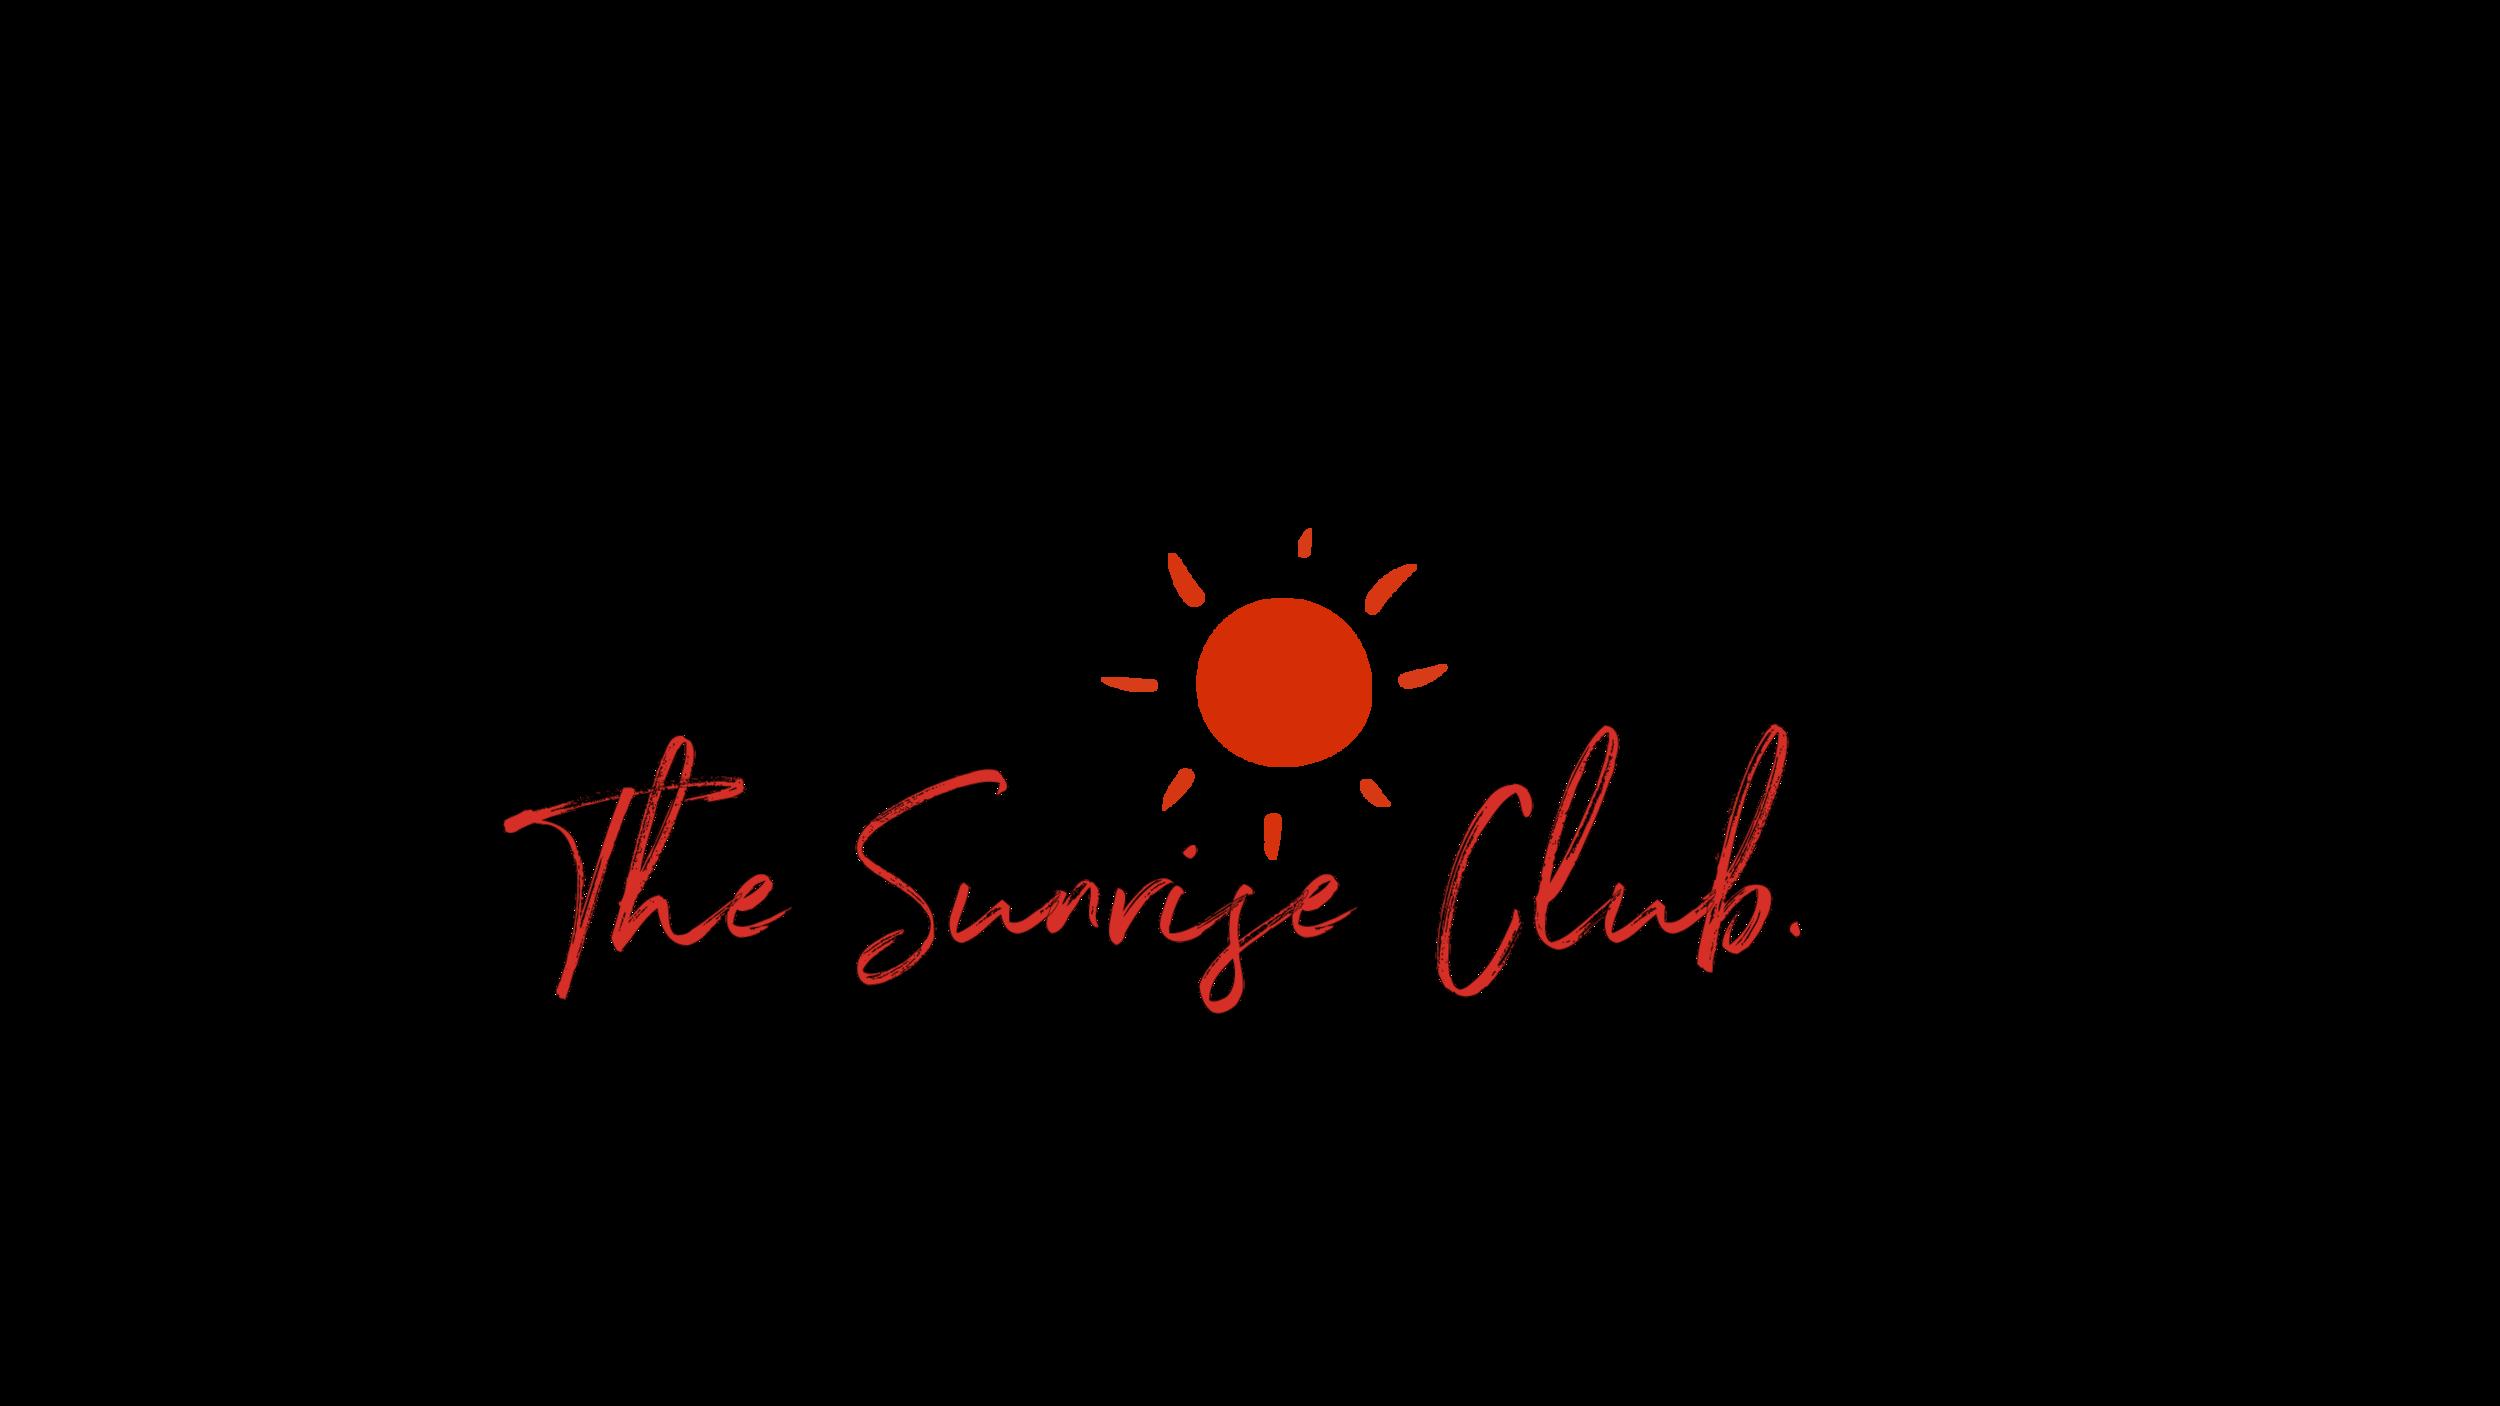 bigger-file-FULL-TRANS-THE-SUNRISE-CLUB.png